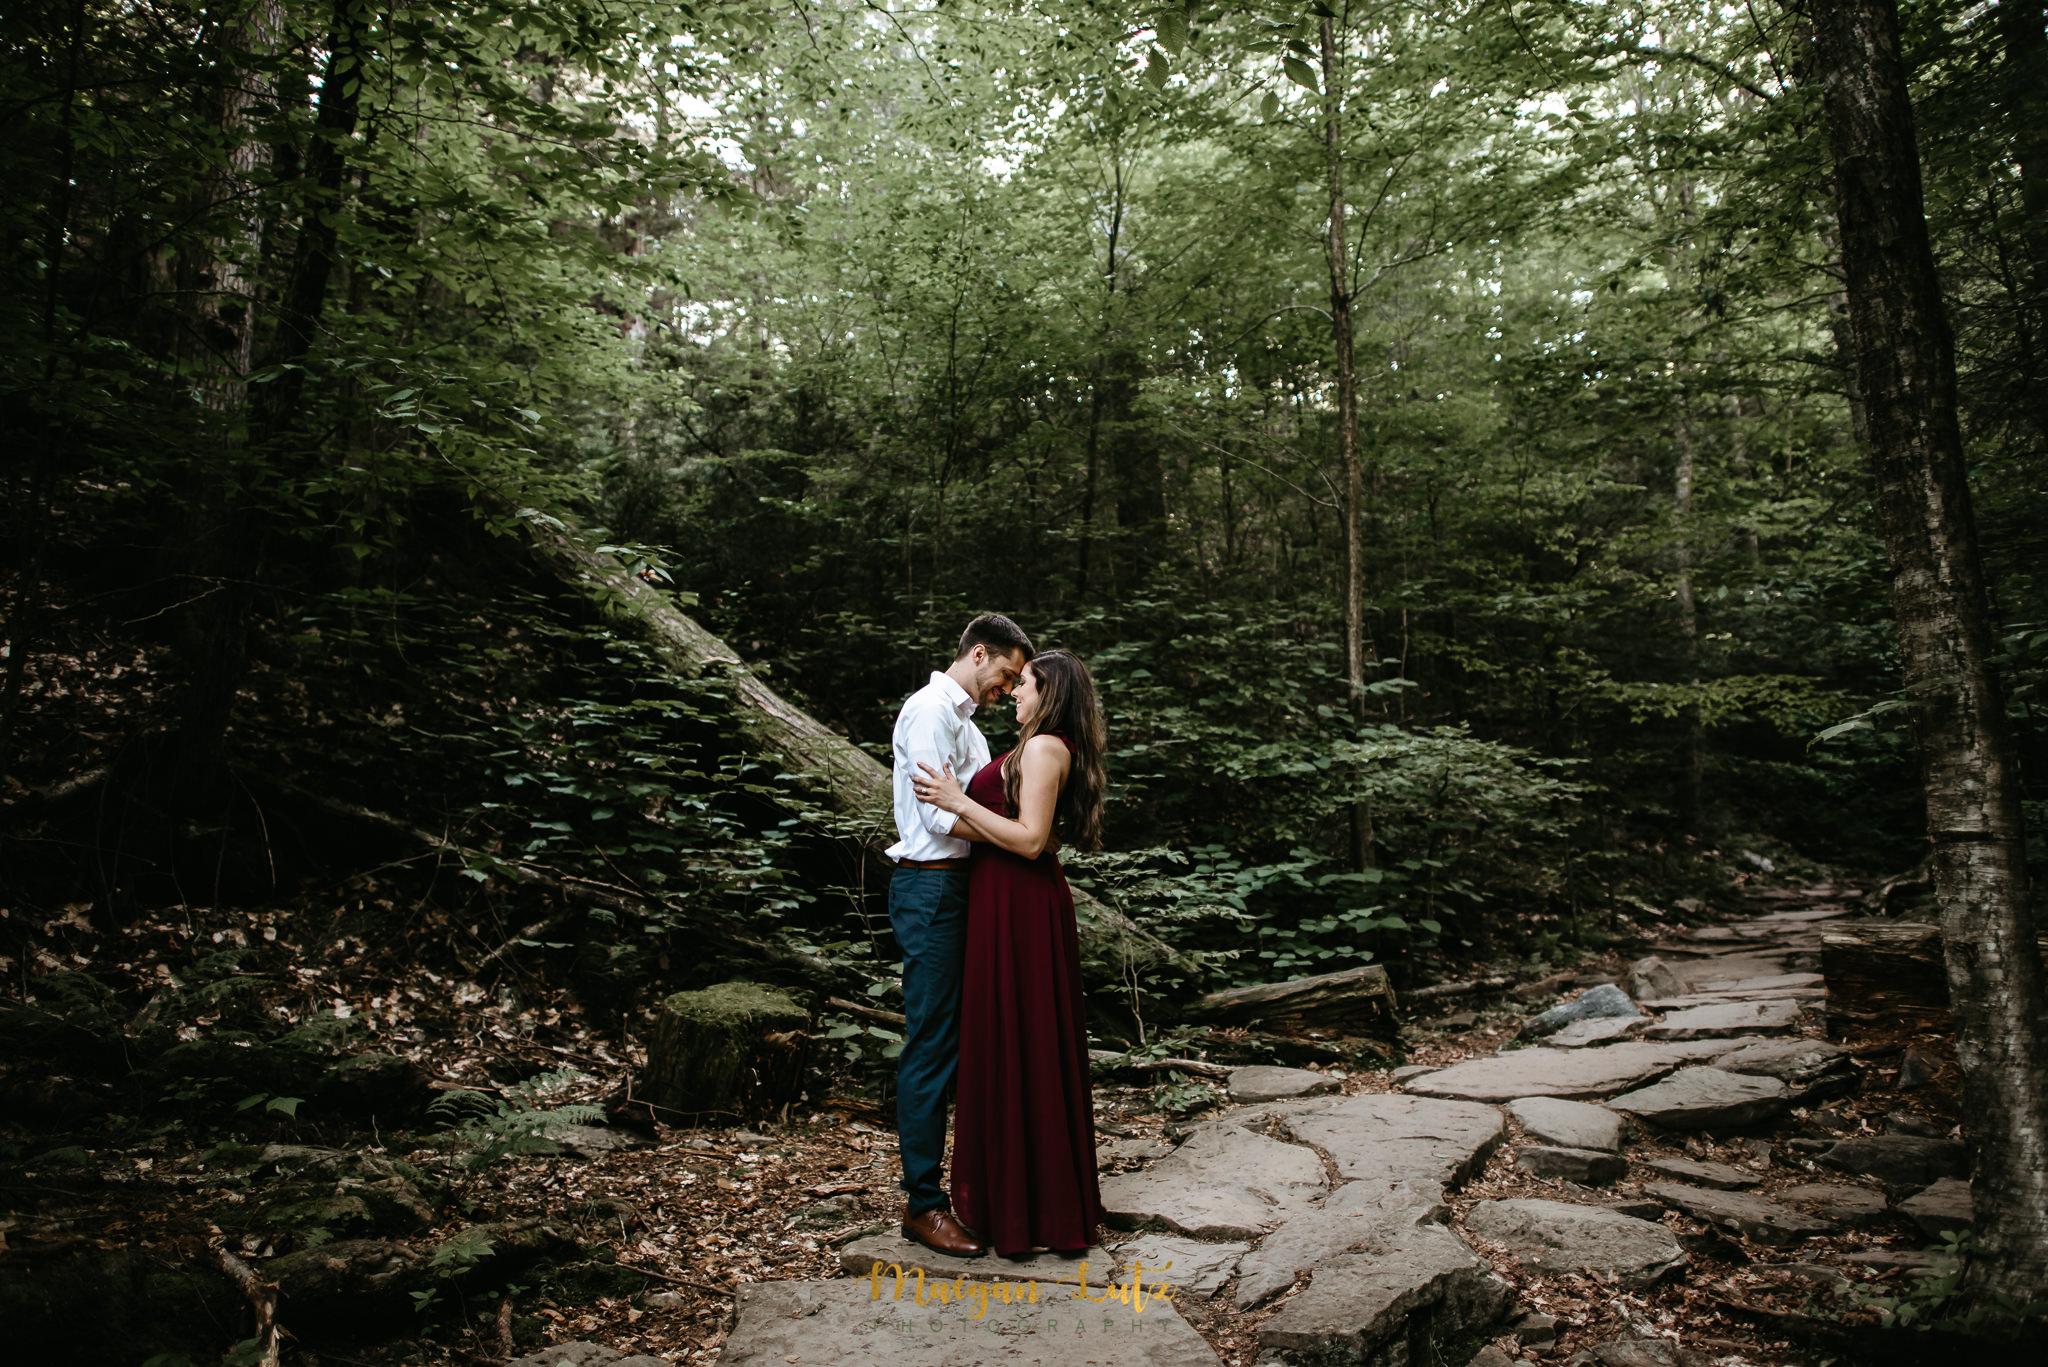 NEPA-Engagement-Wedding-Photographer-Session-at-Ricketts-Glen-State-Park-8.jpg